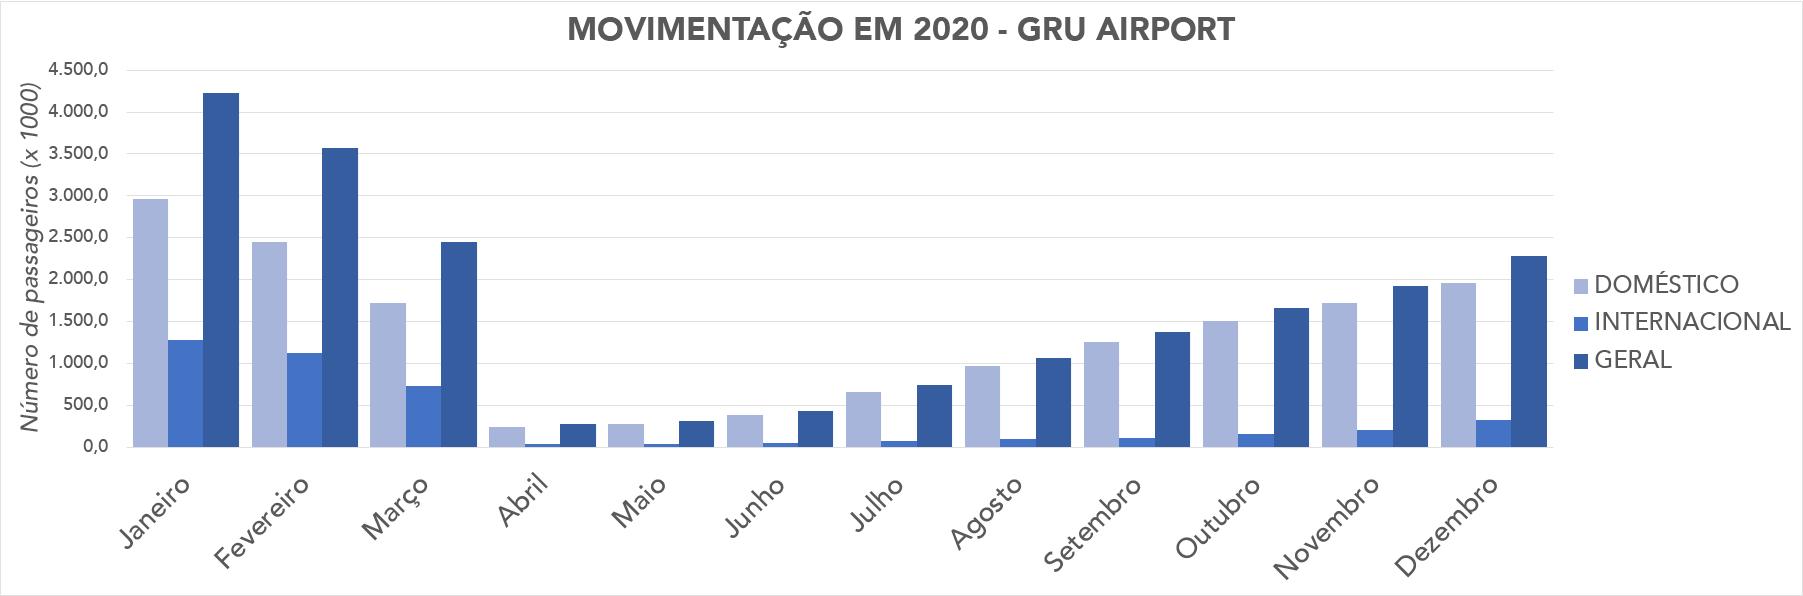 gru - passageiros mes a mes 2020